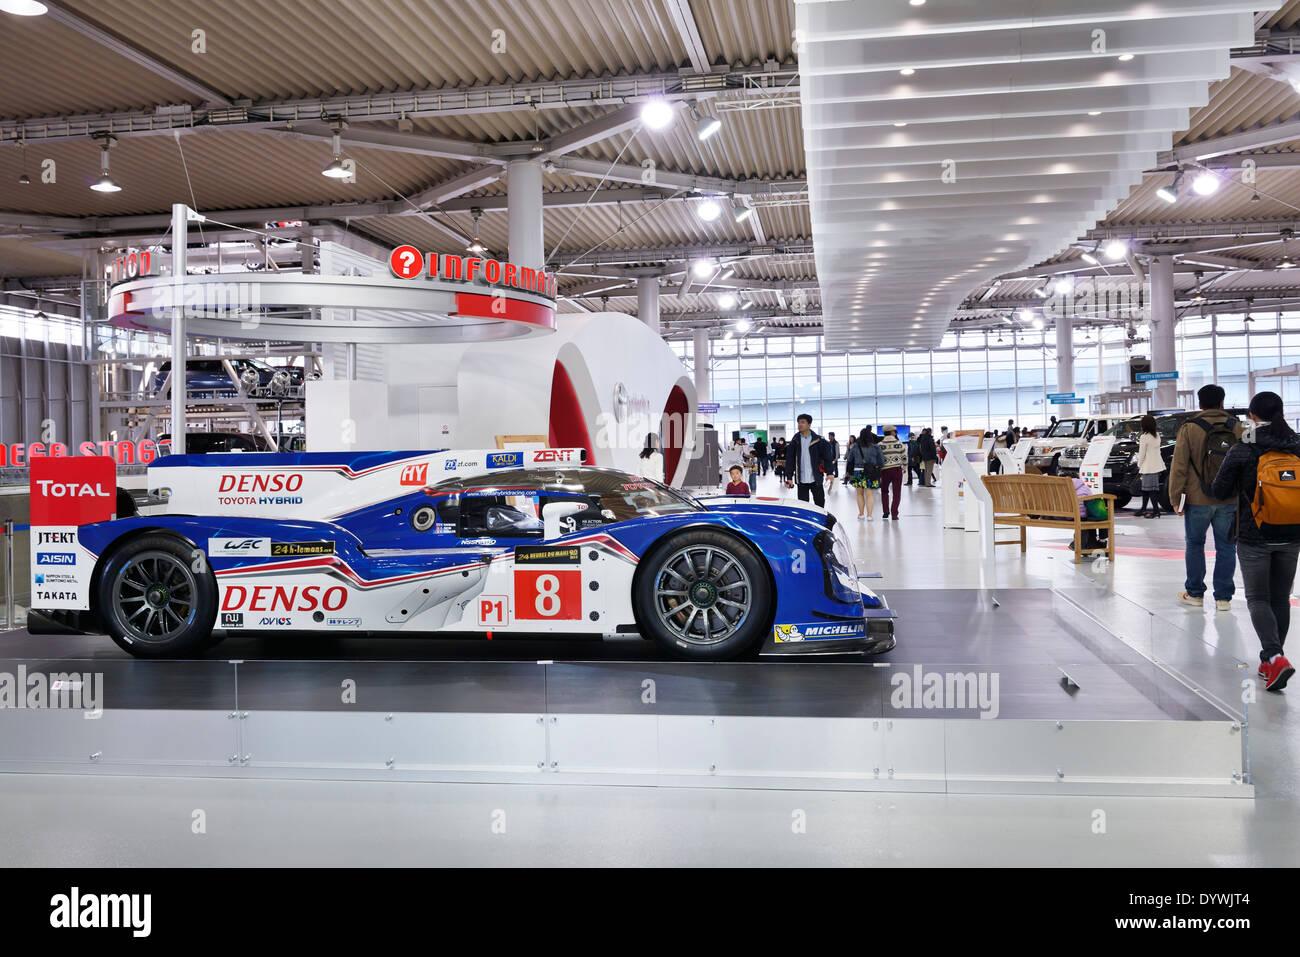 Denso Toyota Hybrid TS040 race car at Toyota Mega Web city showcase at Odaiba, Tokyo, Japan - Stock Image